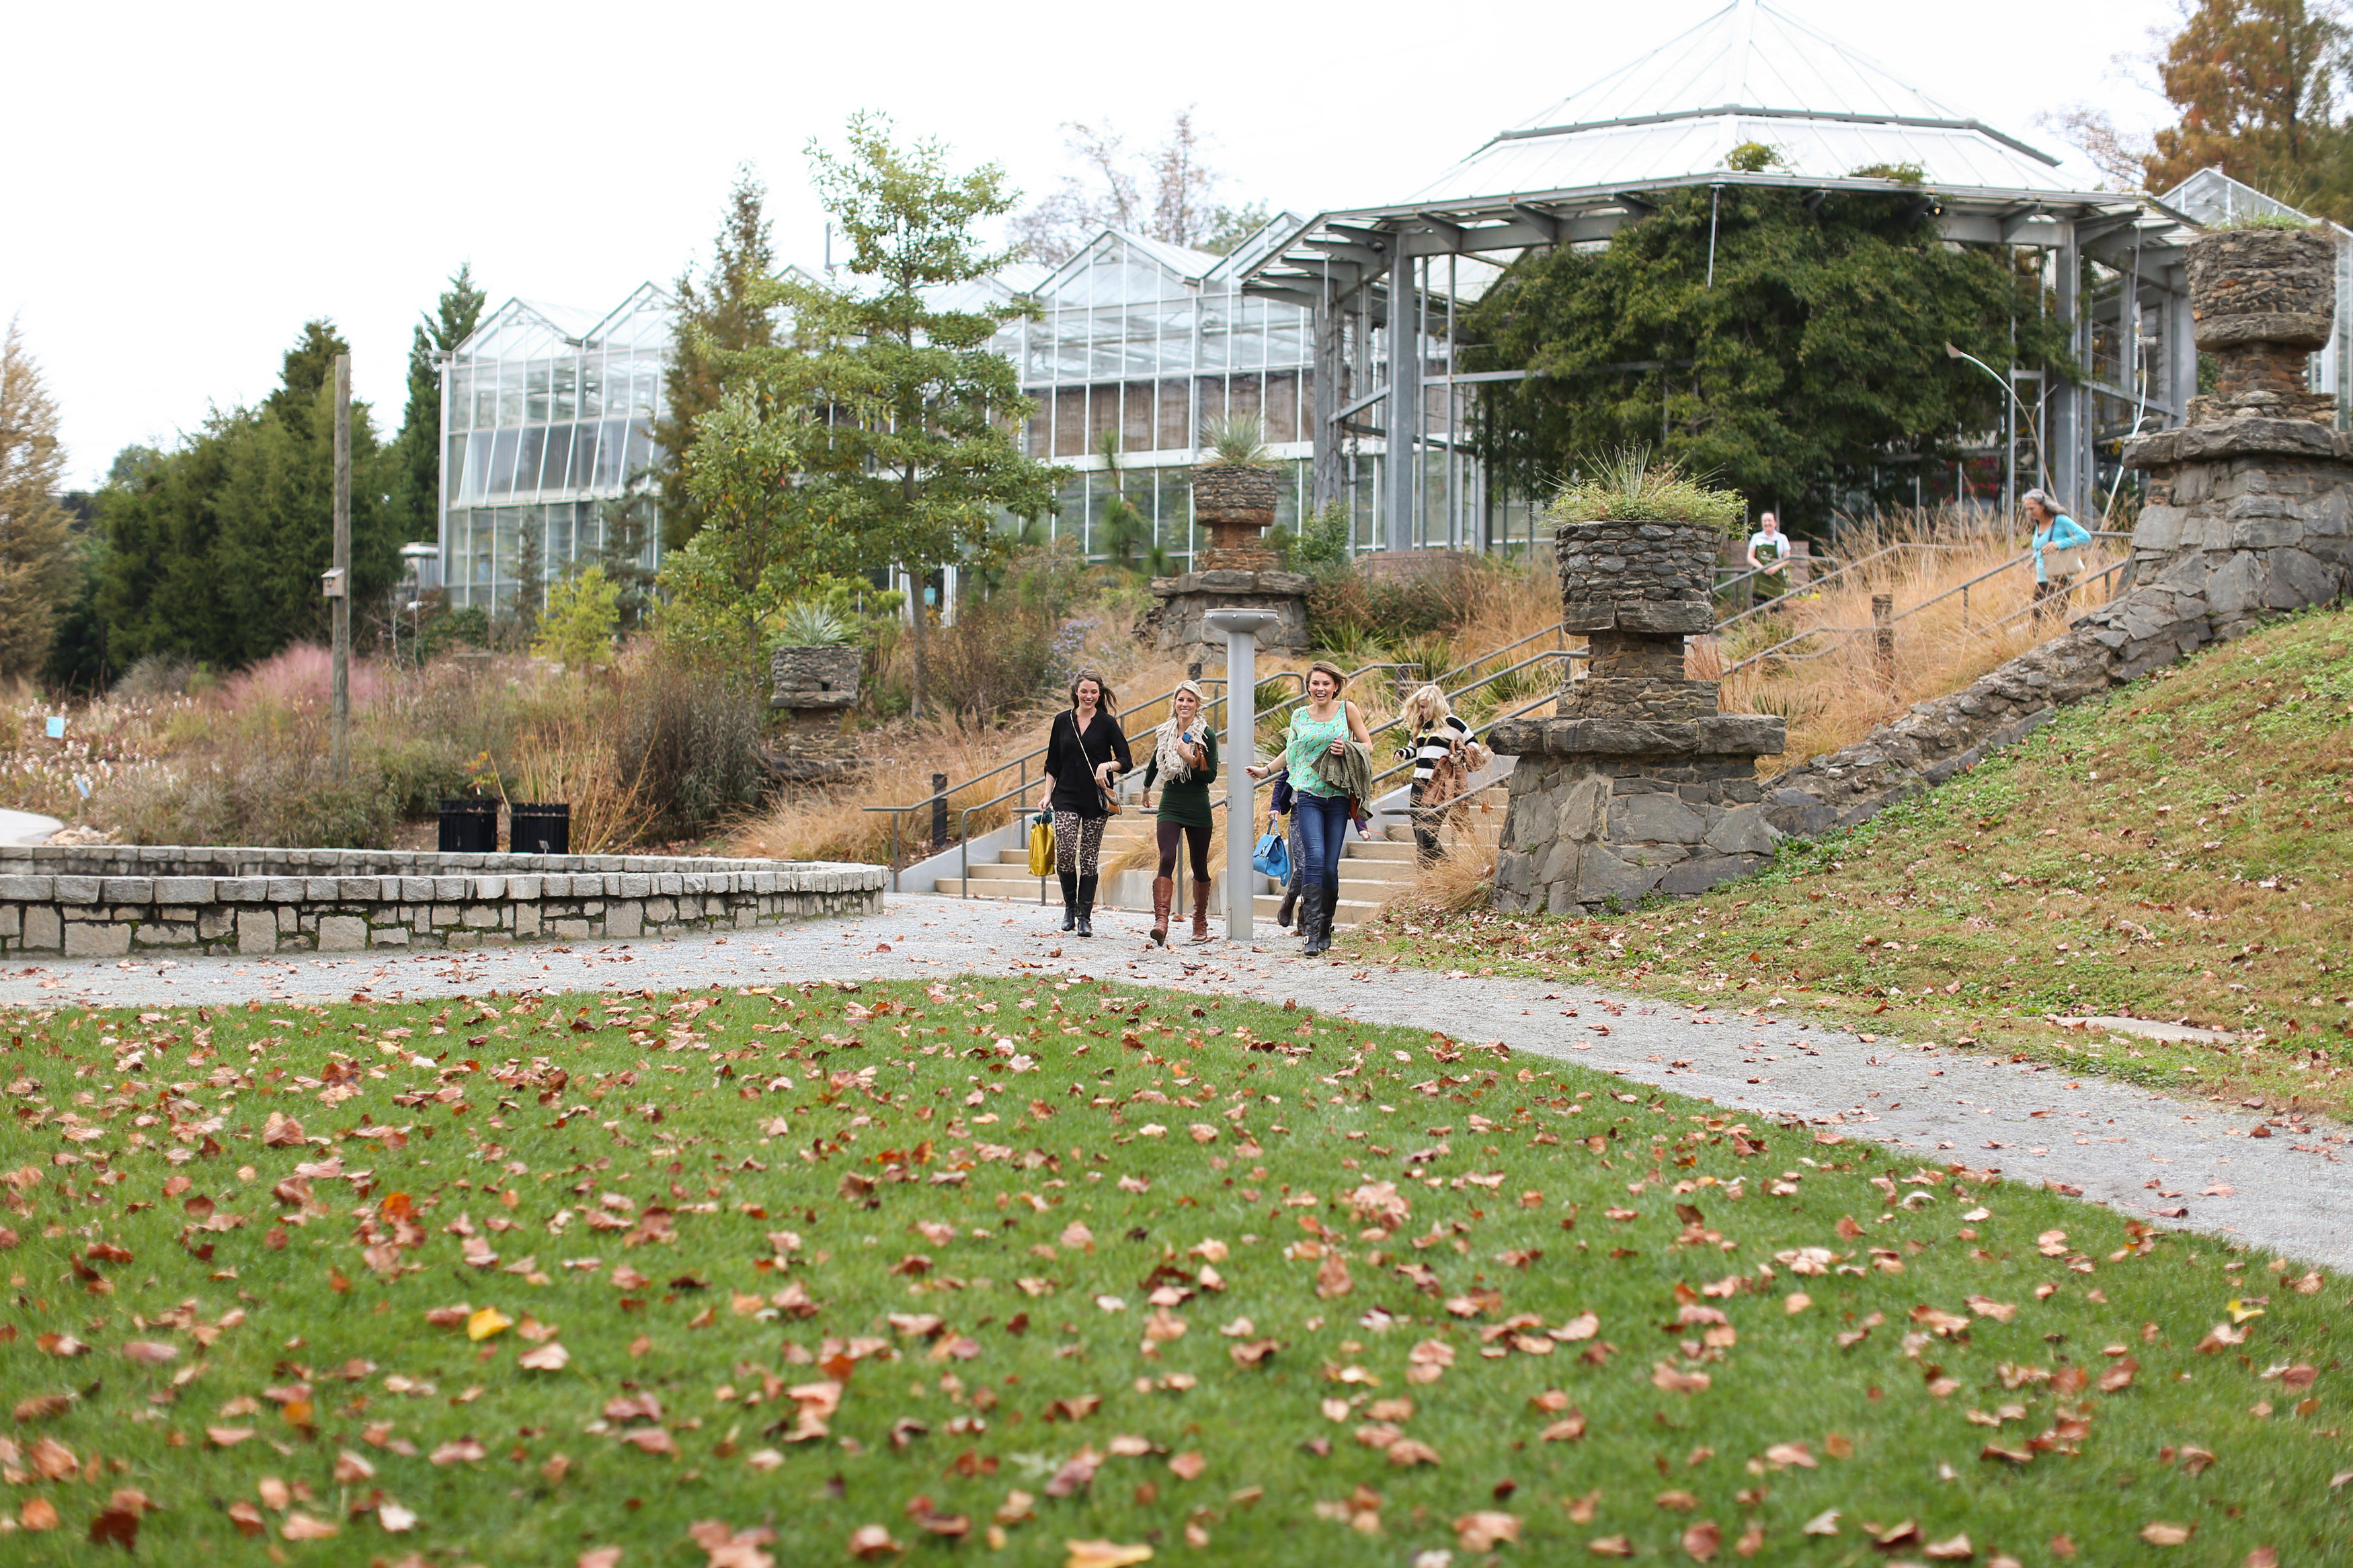 Image 14 of Alex and Lindsey | Atlanta Botanical Gardens Proposal